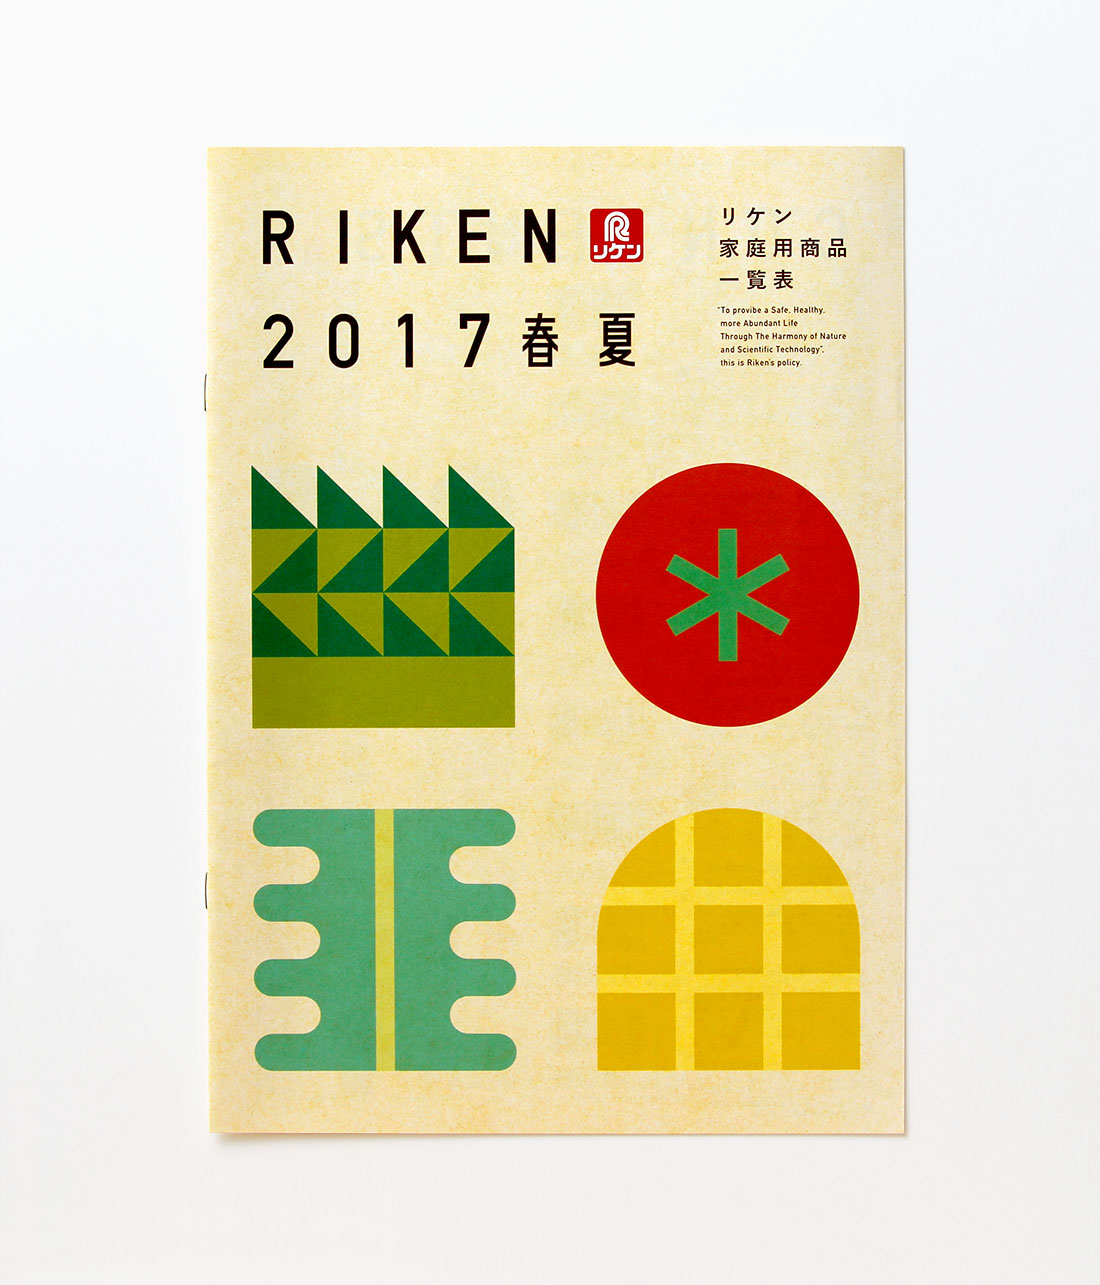 RIKEN 2017